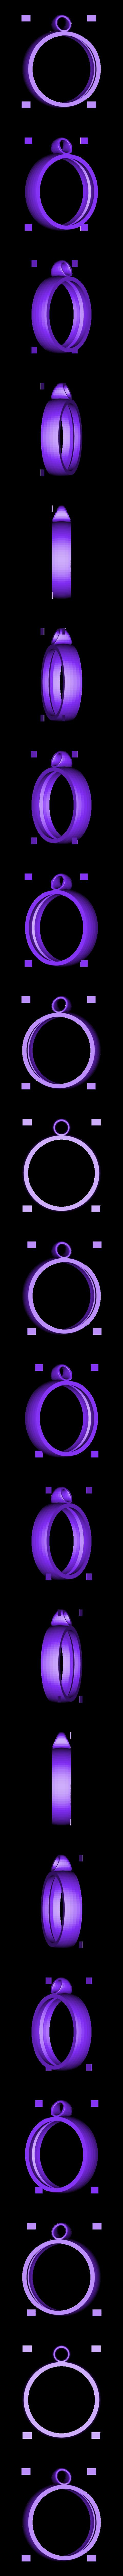 MultiGimbleA.stl Download free STL file Boron Gimble Keychain • 3D print model, ykratter